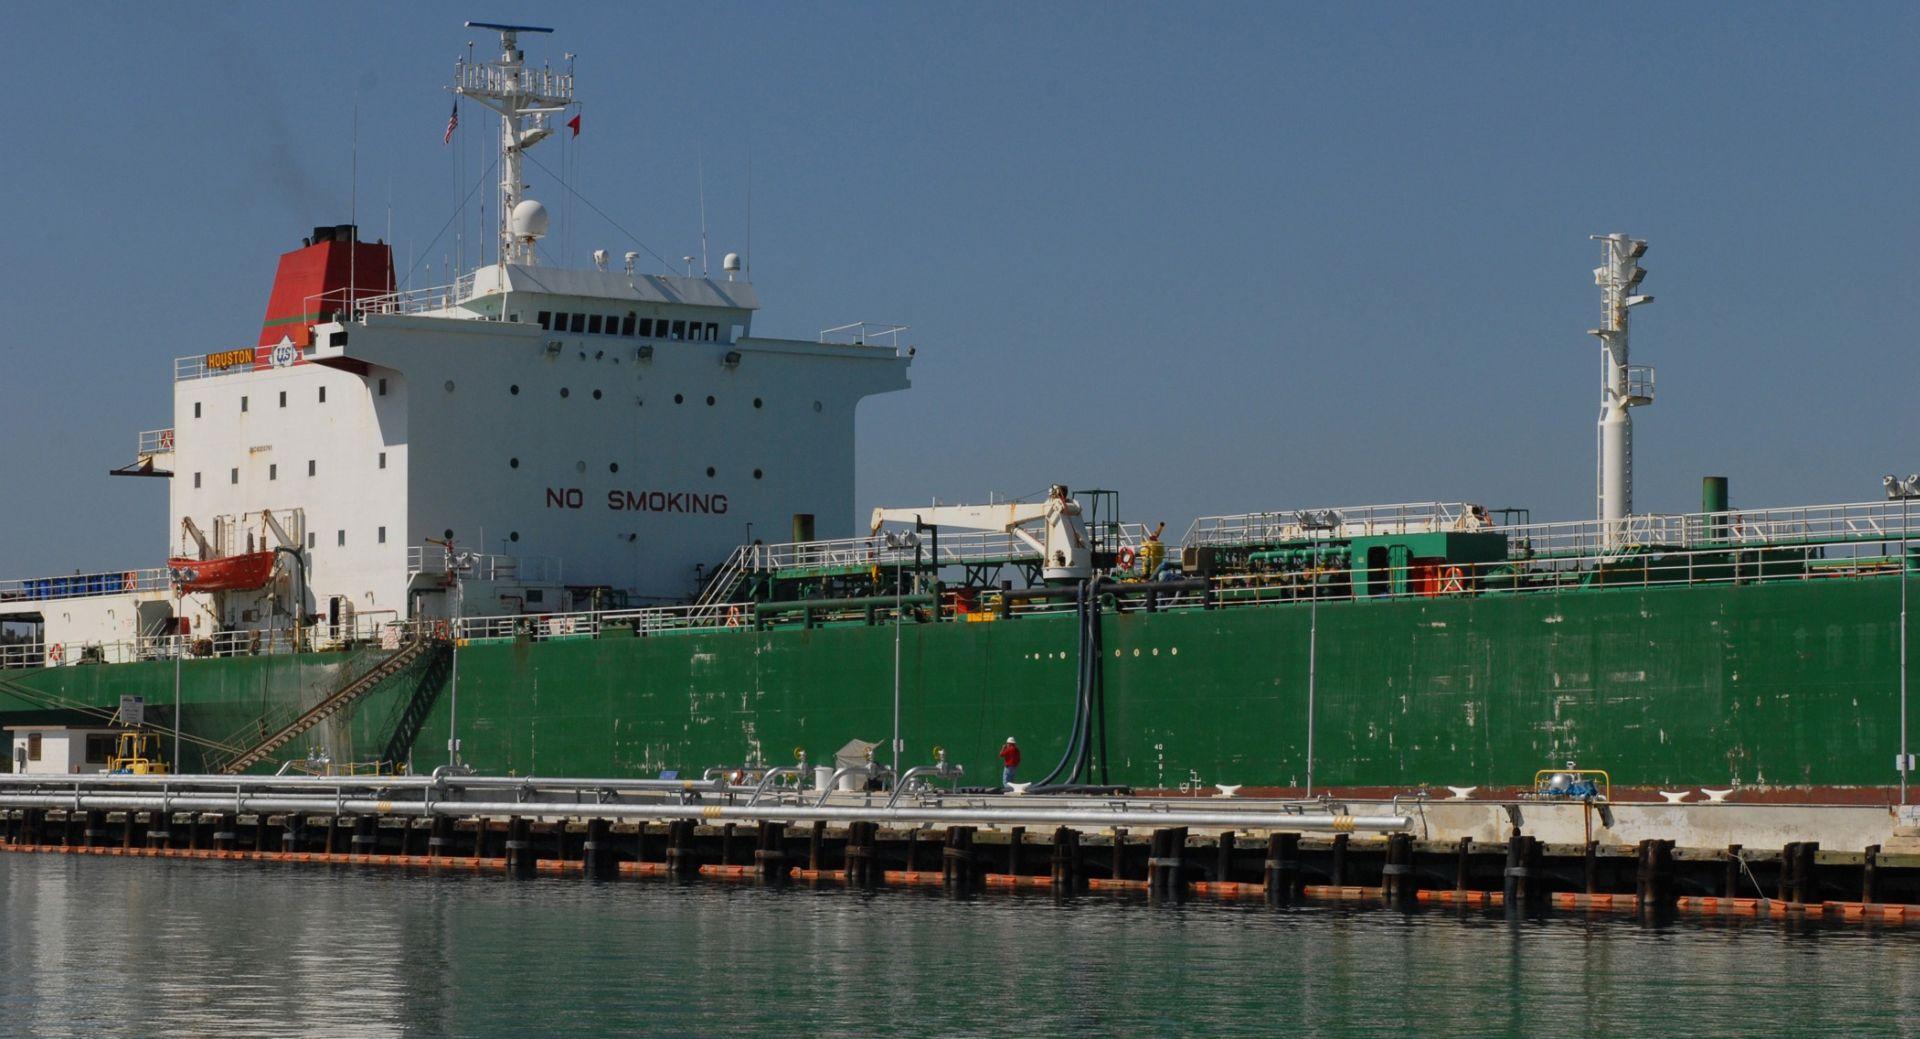 PREVOZIO SAMO MORSKU VODU Zapalio se ruski tanker na Kaspijskom jezeru